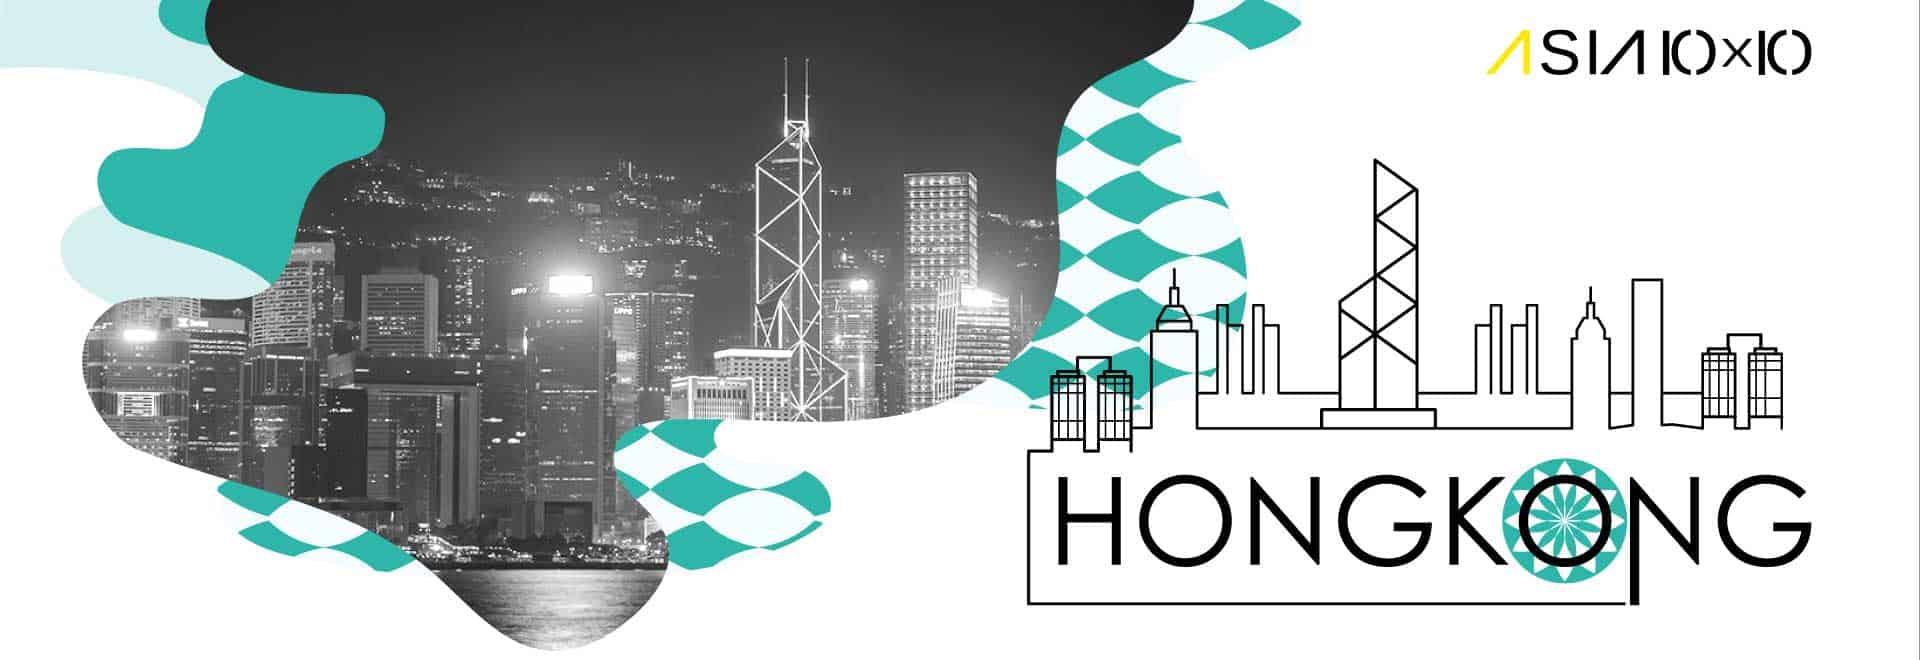 bg-asia1010-HongKong